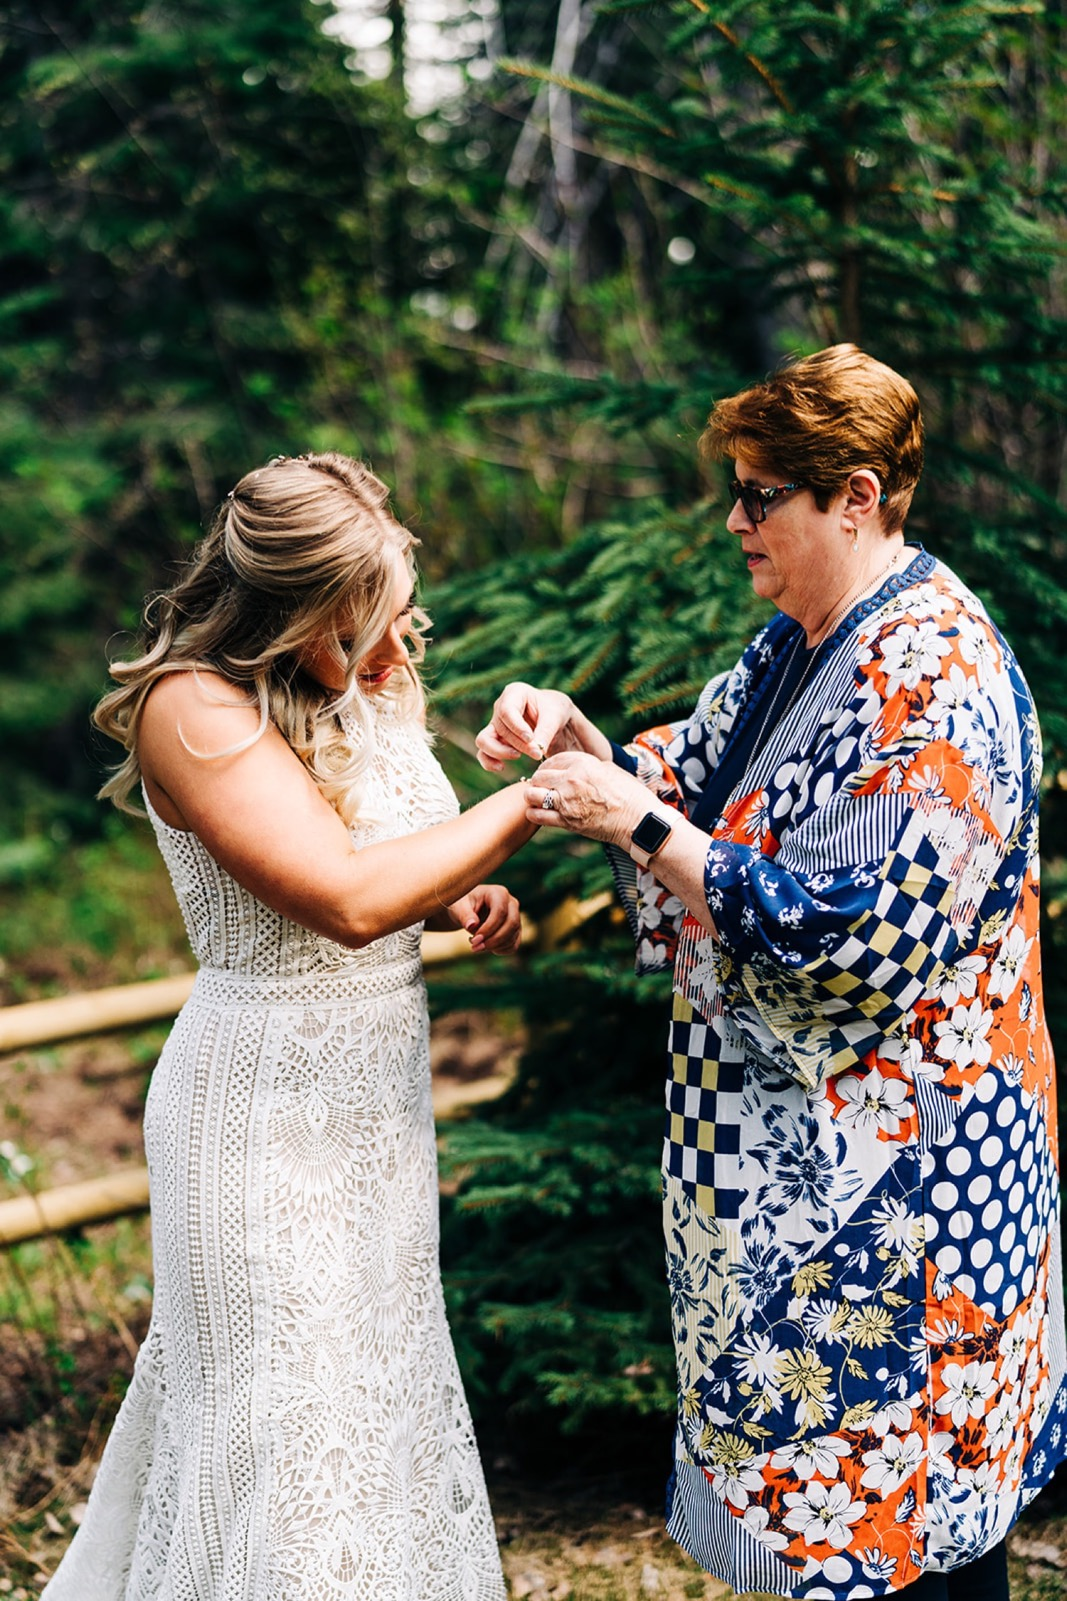 027_falissa_heather_wedding-80.jpg